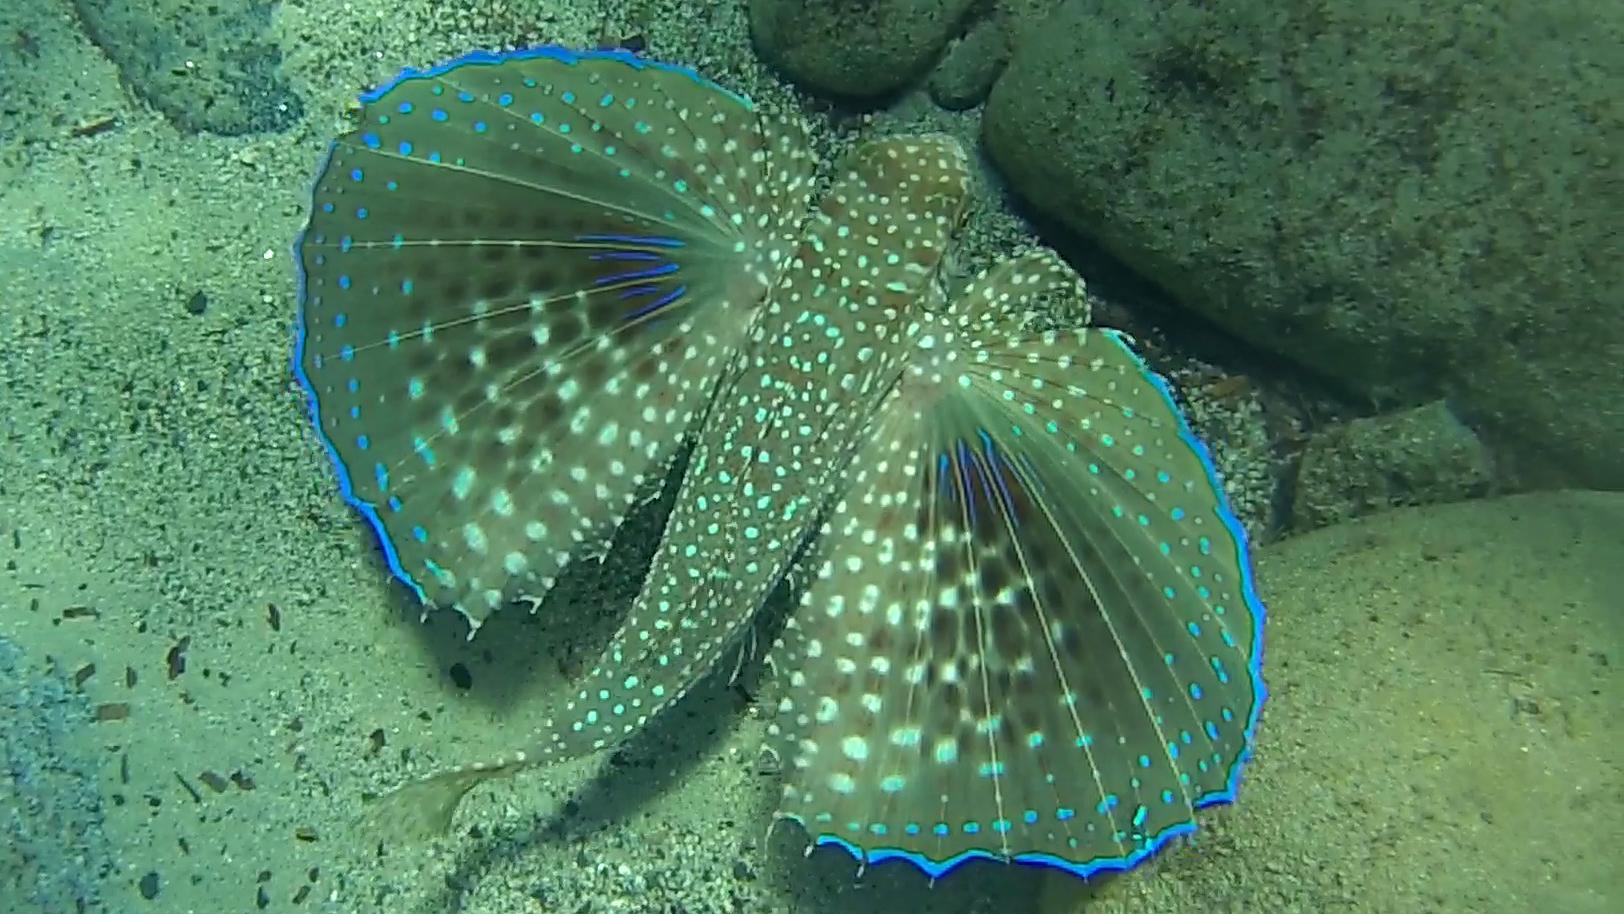 Pesce civetta Dactylopterus volitans Rondine di Mare Flying gurnard intotheblue.it